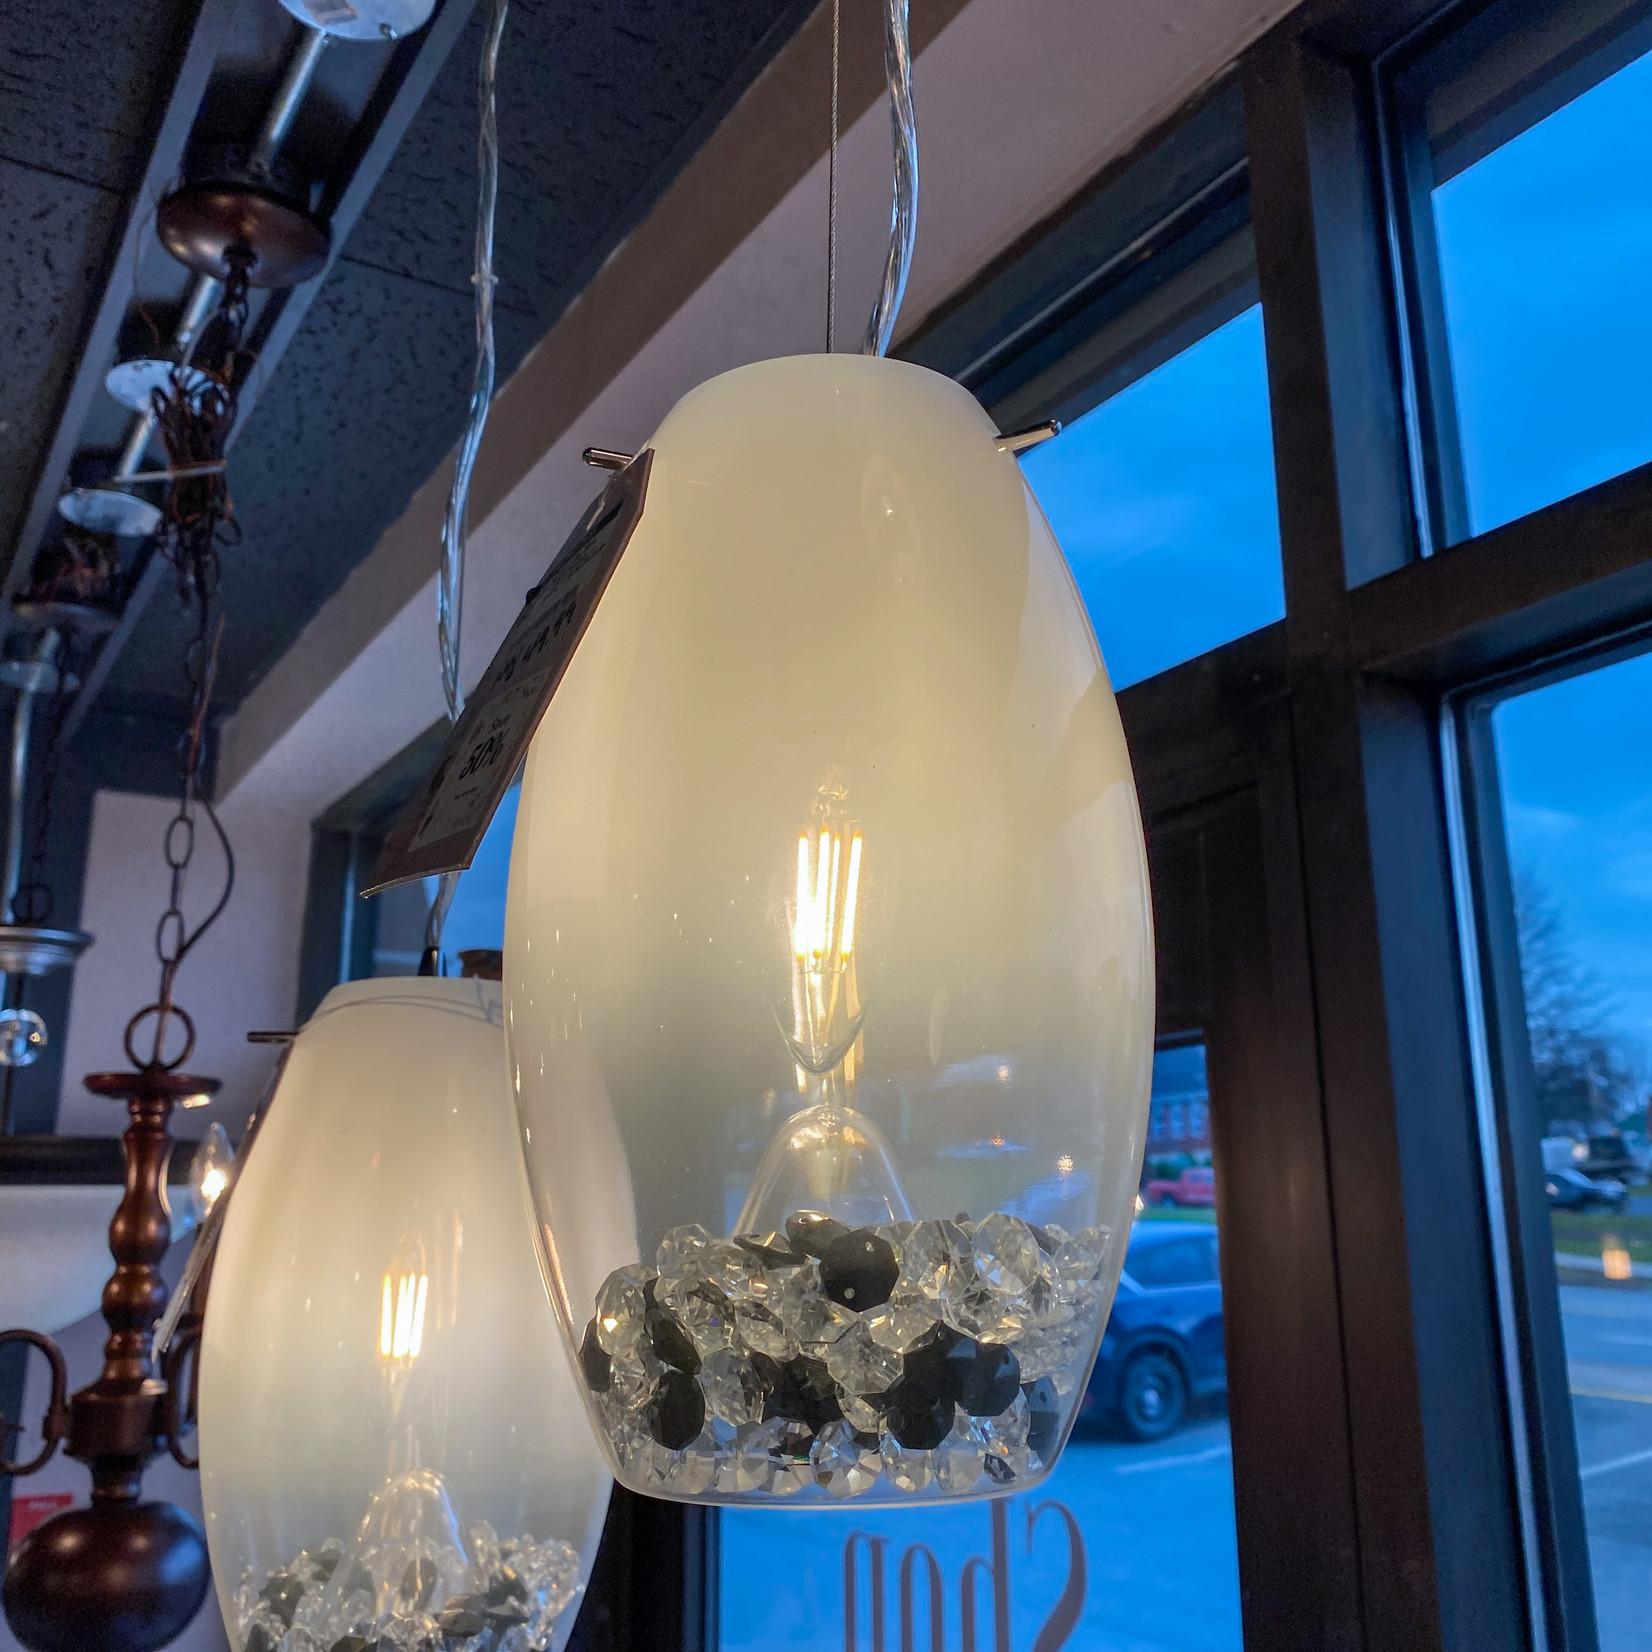 Hampton Bay Hampton Bay Reva 1-Light Pendant - Chrome - FINAL SALE